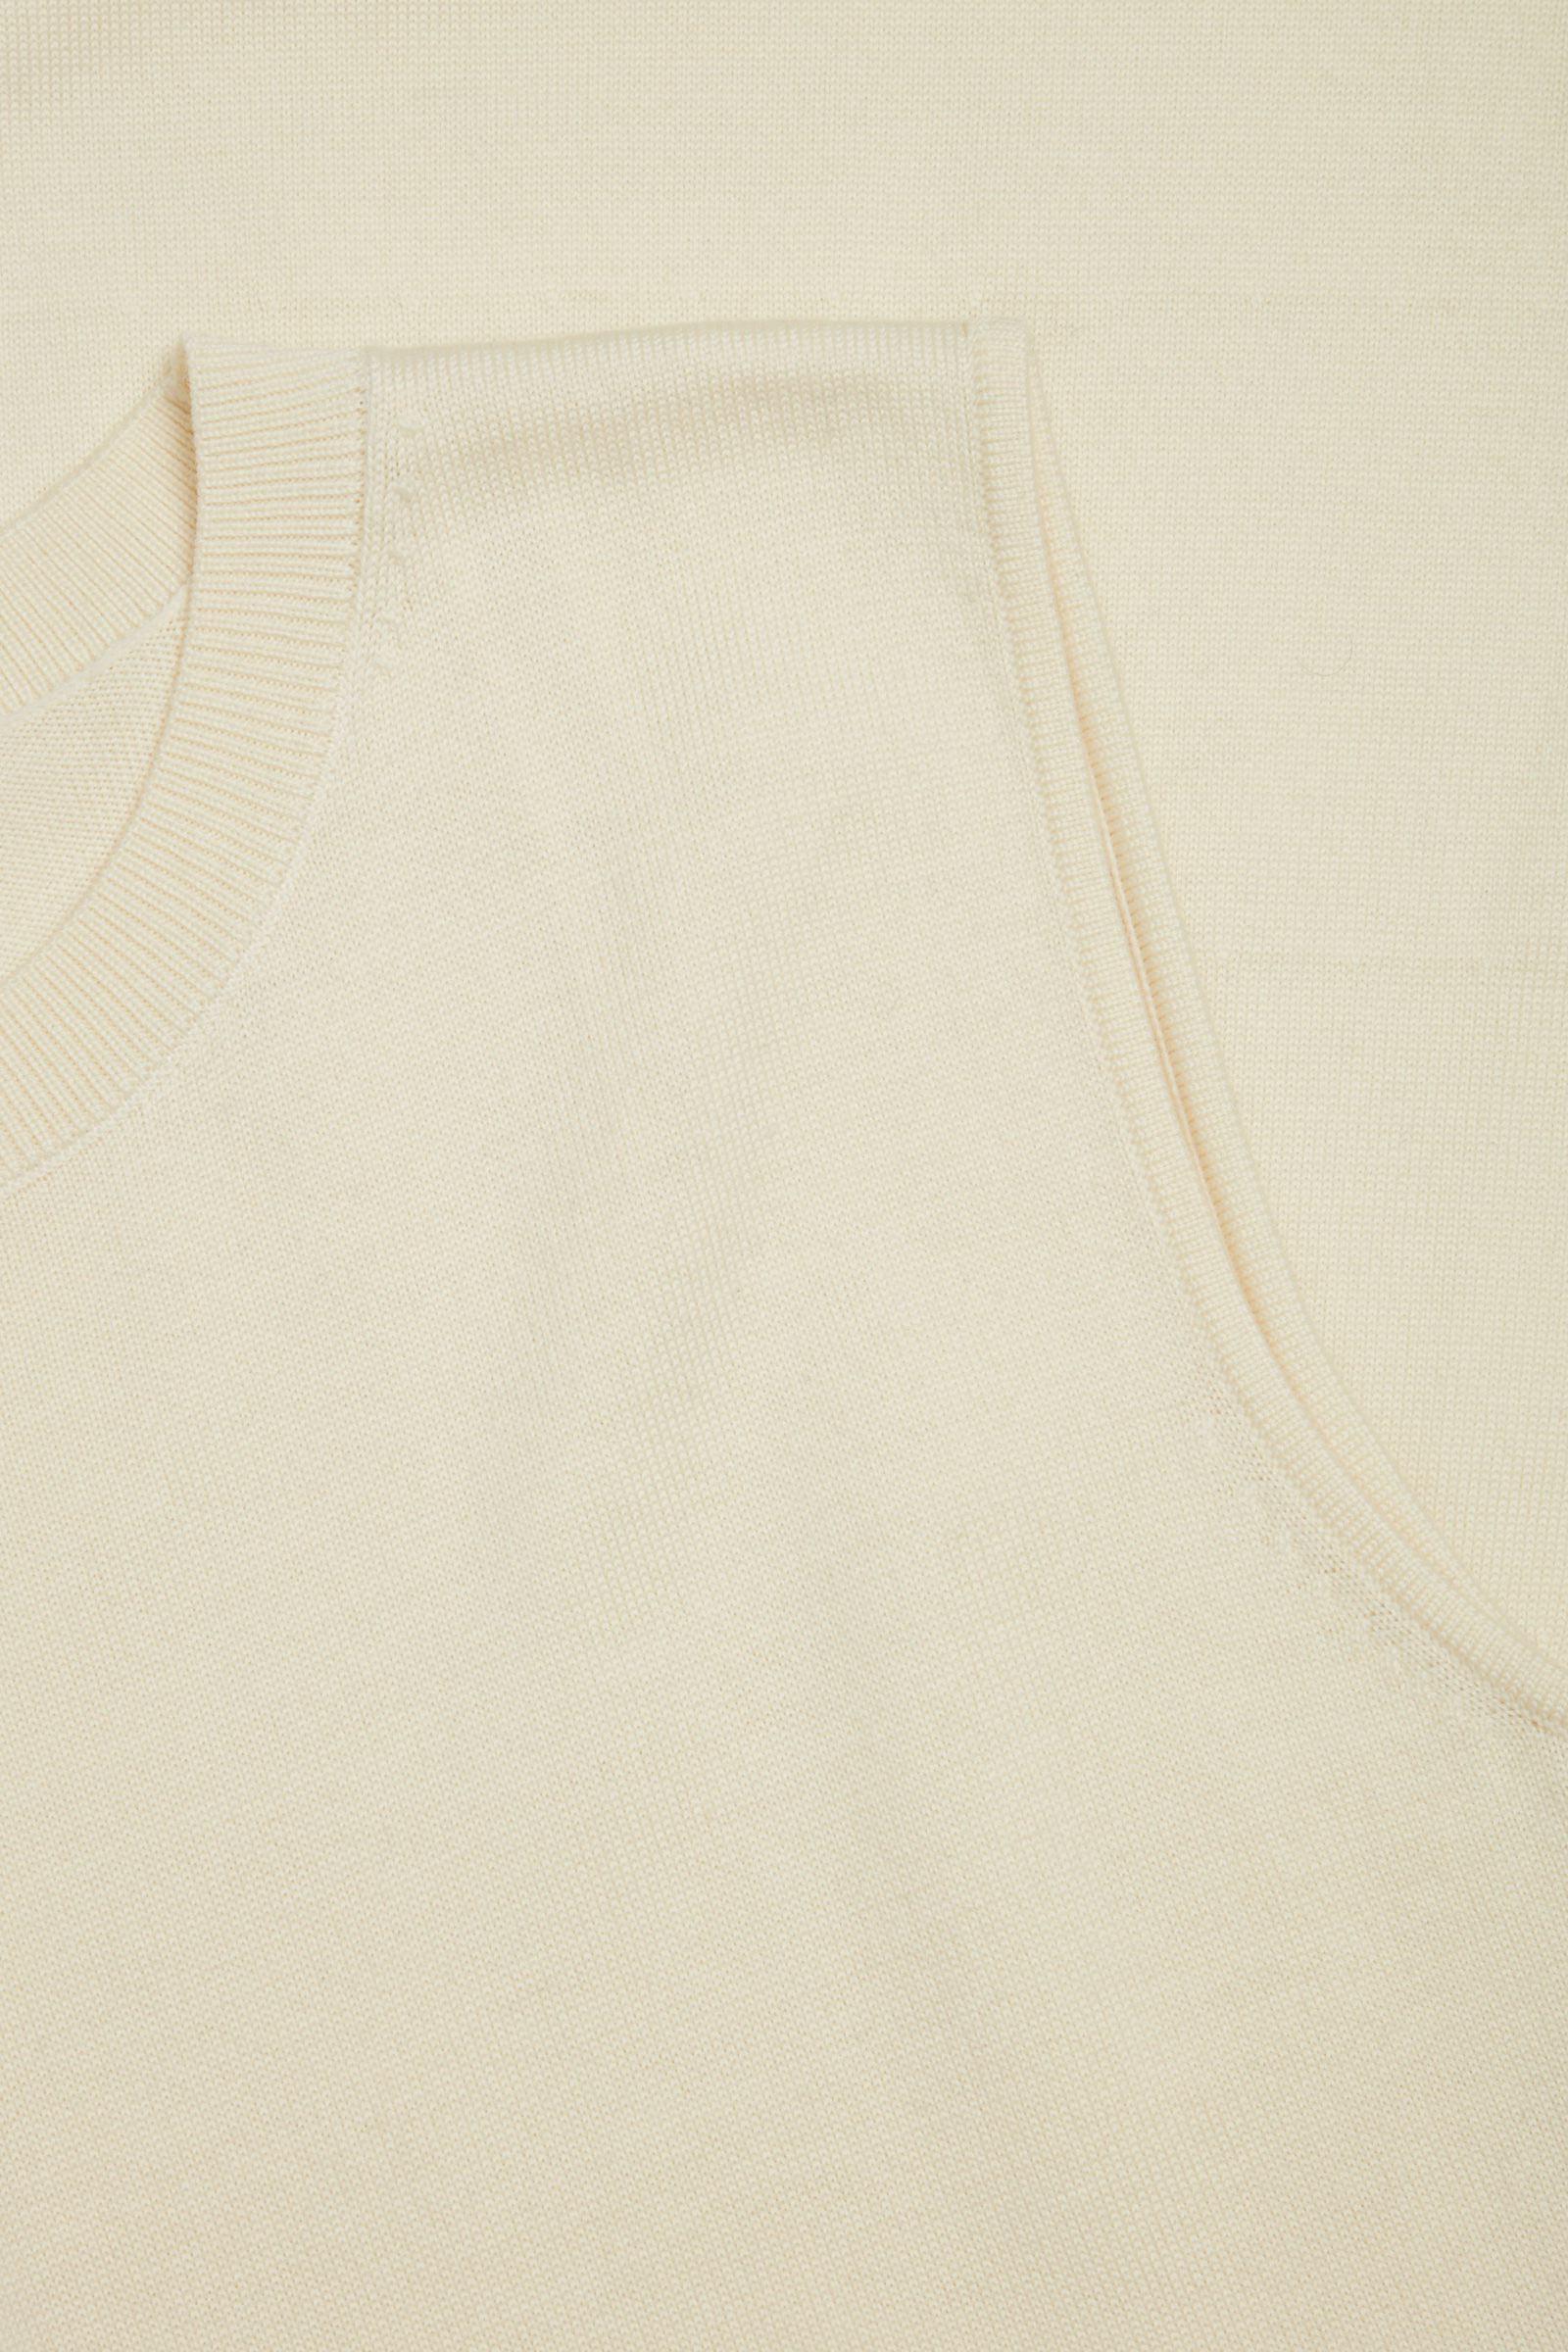 COS 니티드 A라인 메리노 울 드레스의 오프 화이트컬러 Detail입니다.